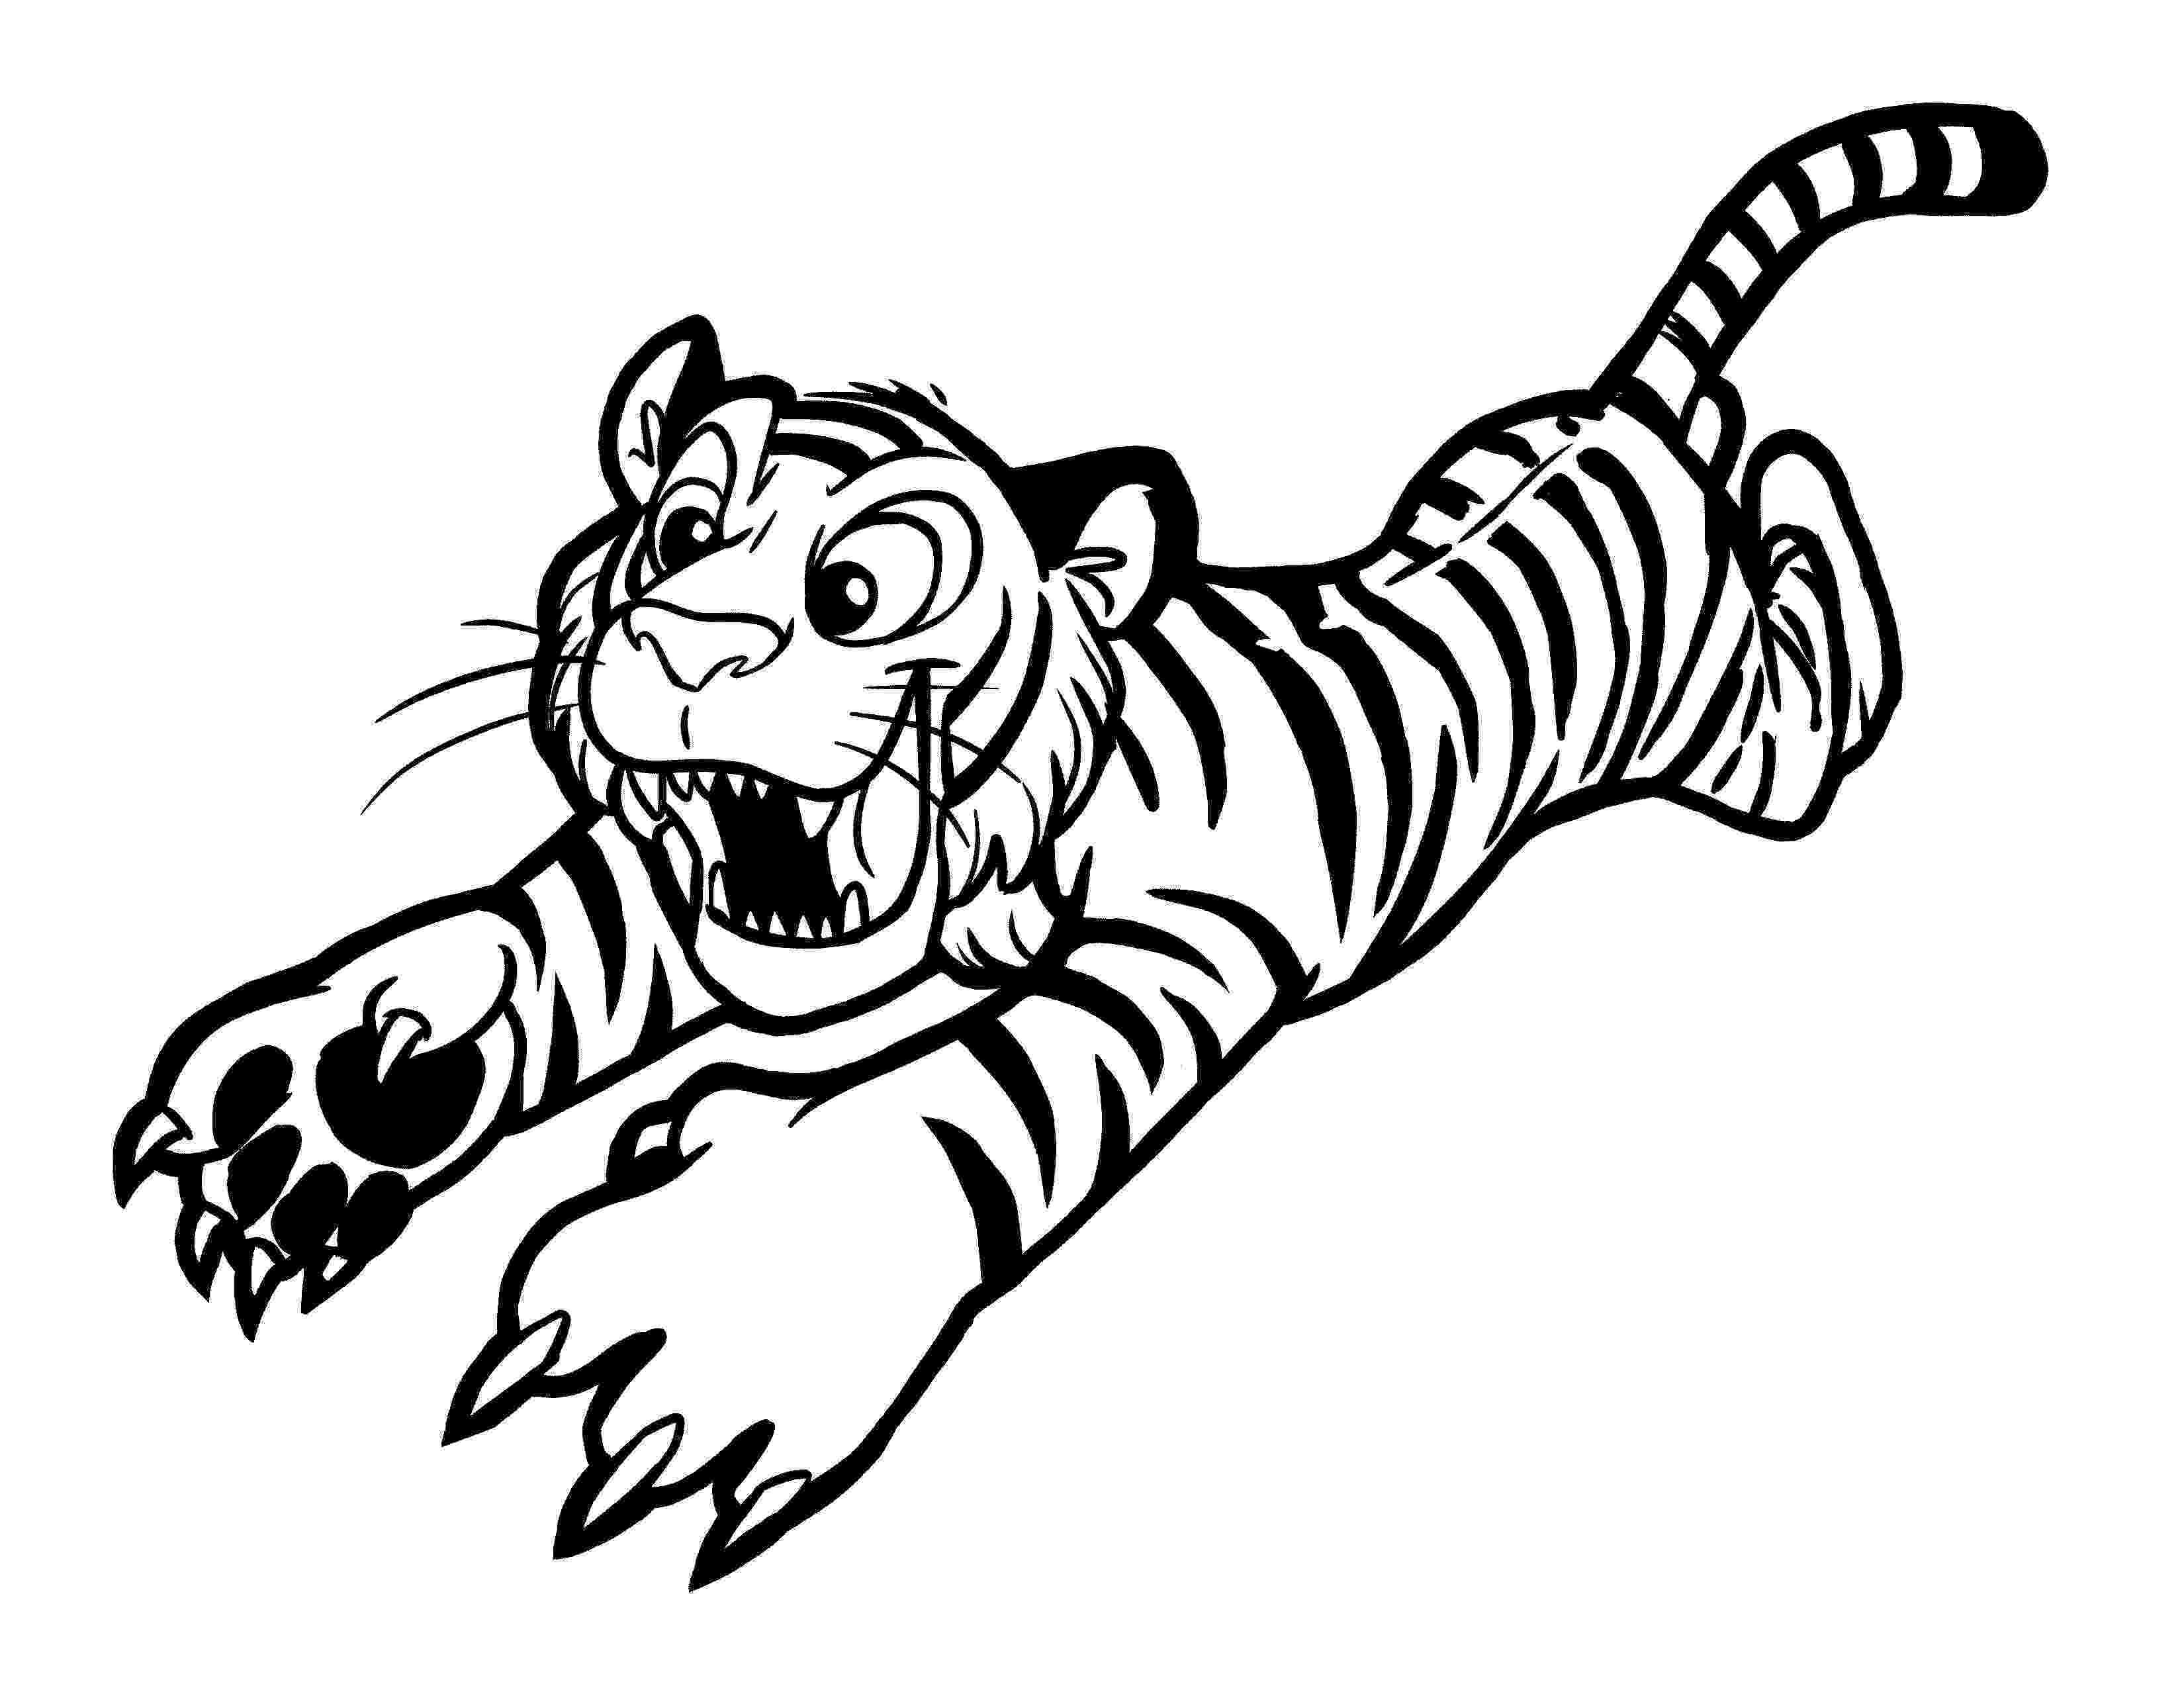 tiger printable free printable tiger coloring pages for kids tiger printable 1 1